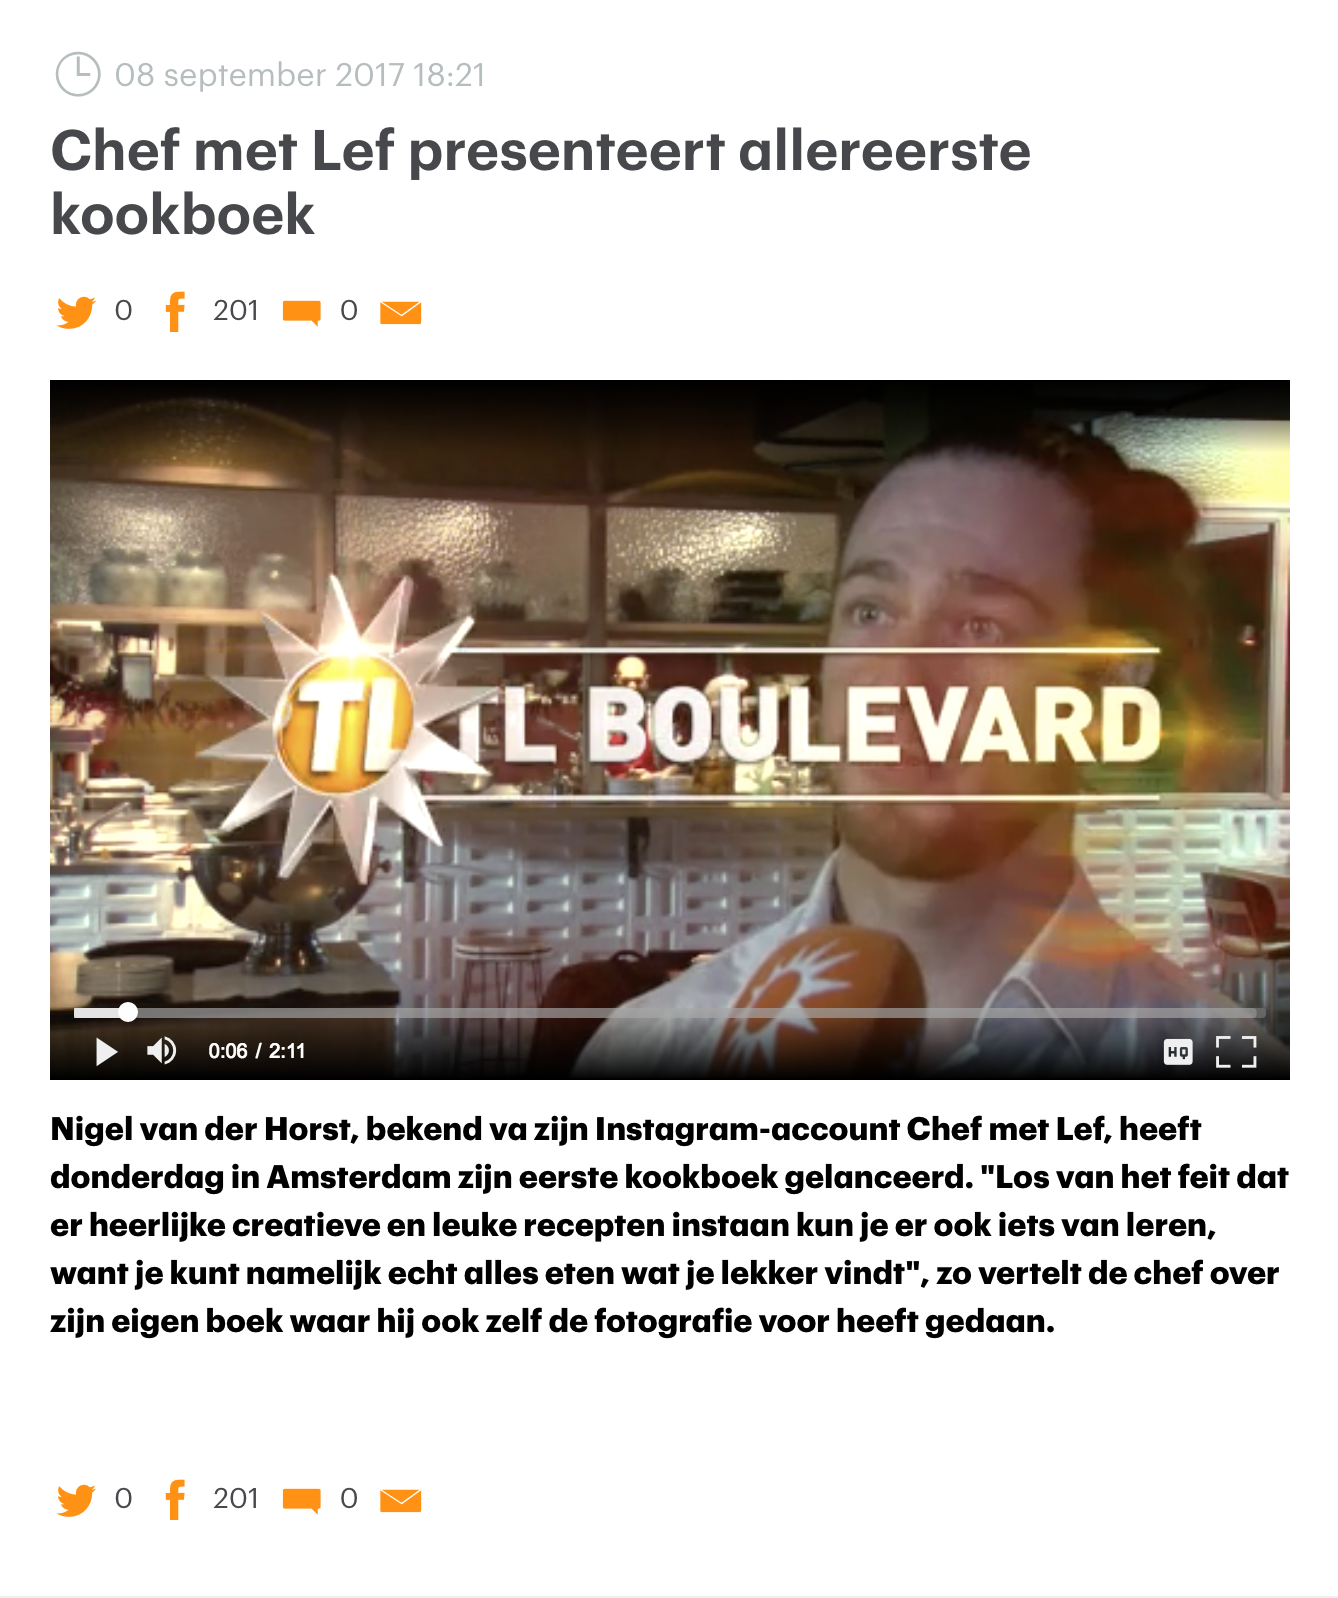 Video https://www.rtlnieuws.nl/boulevard/laatste-videos-boulevard/chef-met-lef-presenteert-allereerste-kookboek